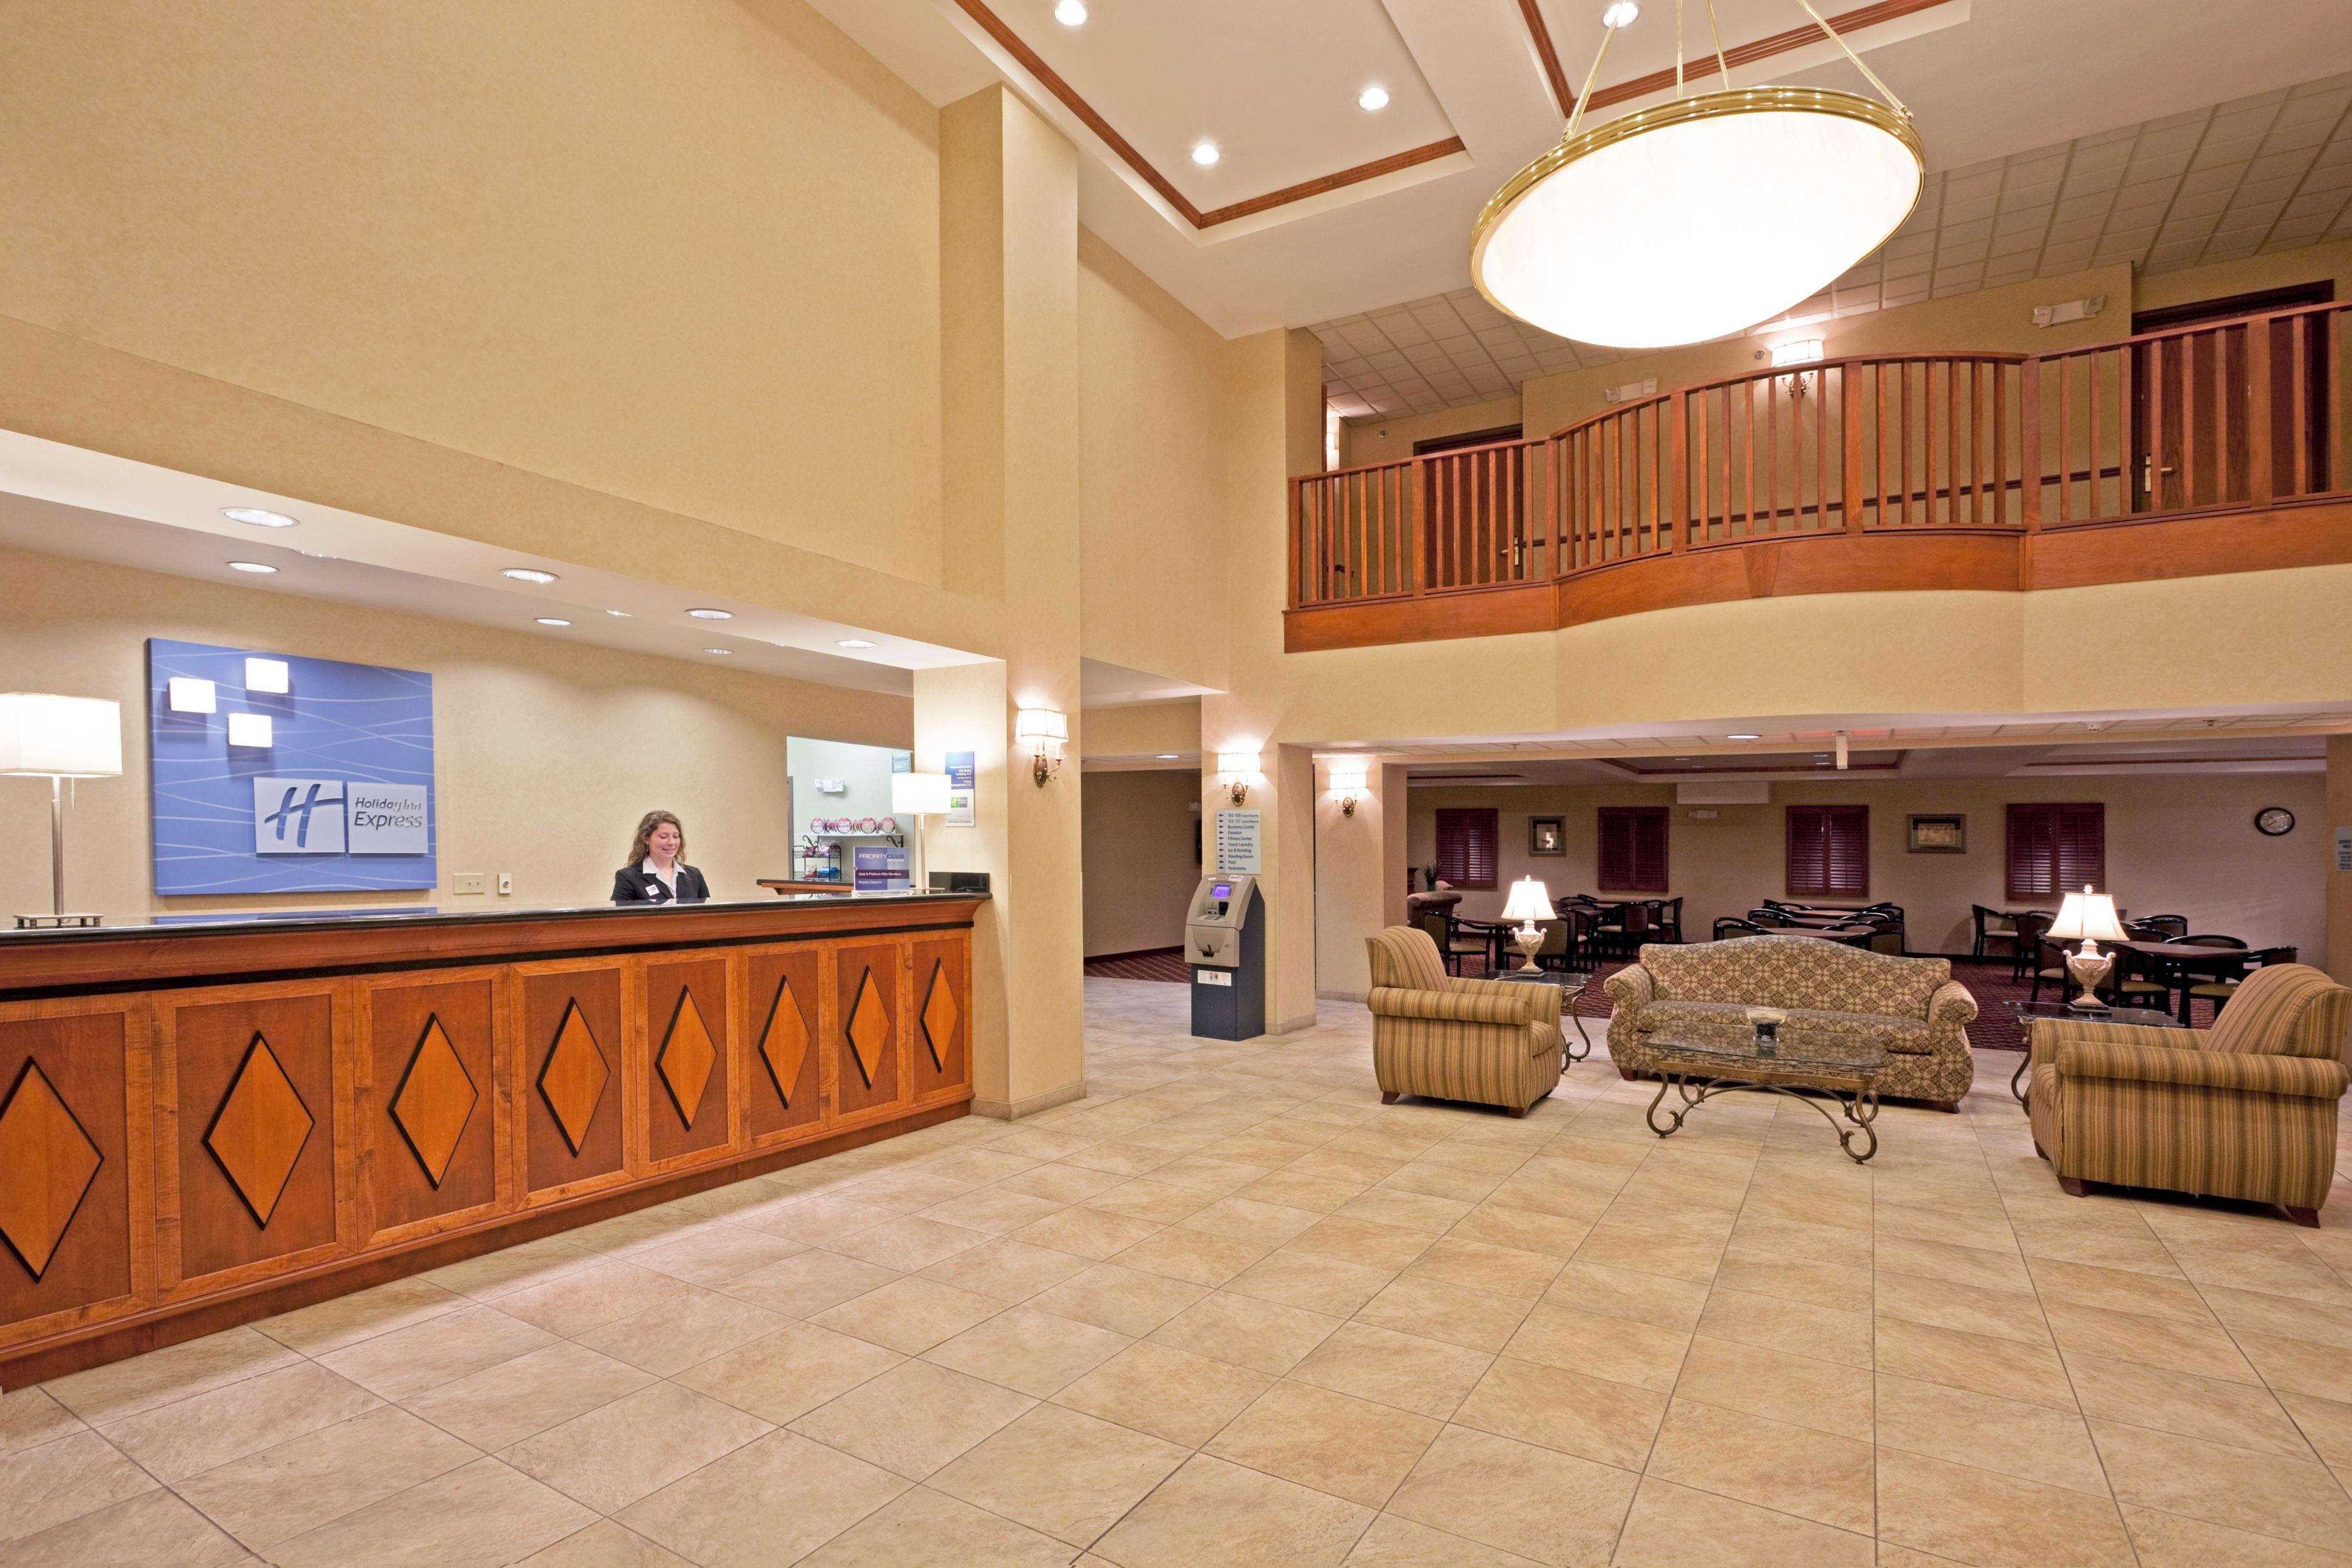 Holiday Inn Express Syracuse-Fairgrounds image 4